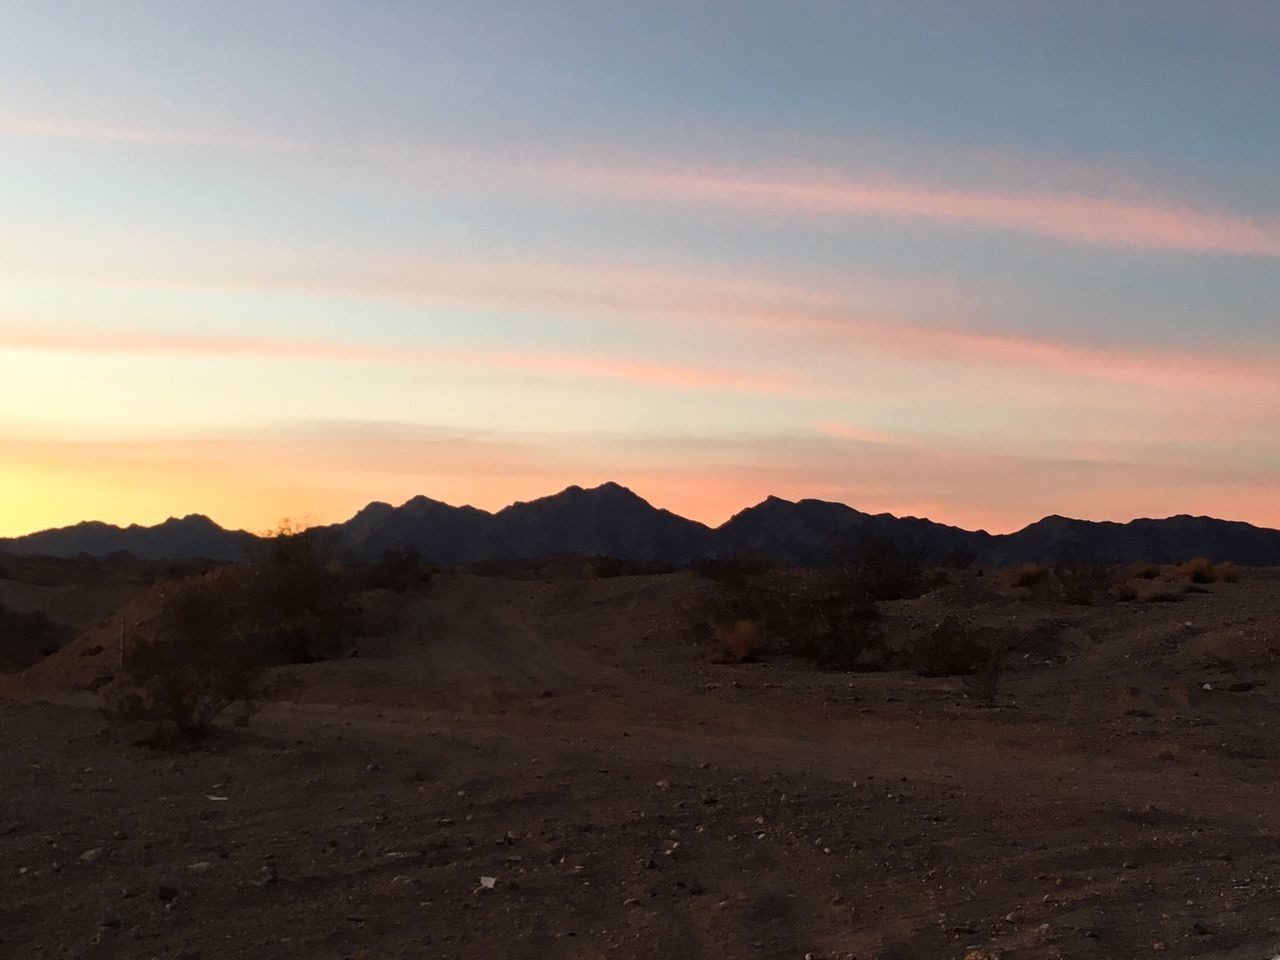 Landscape Sunset Scenics Geology Arid Climate Outdoors No People Mountain Sky Desert Beauty